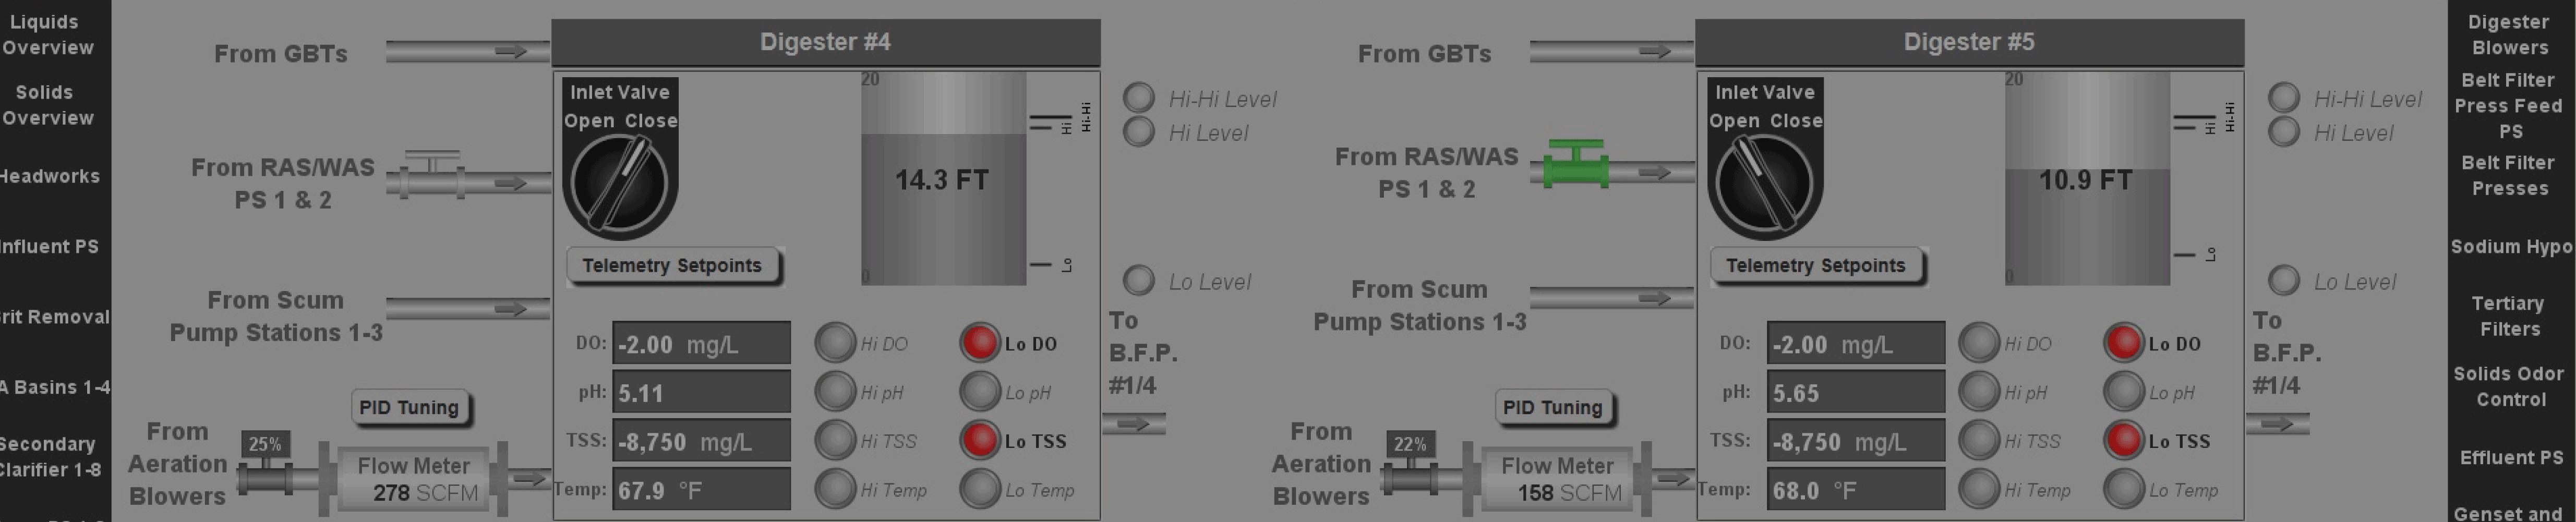 SCADA-Screen-Divider-Image-1-1